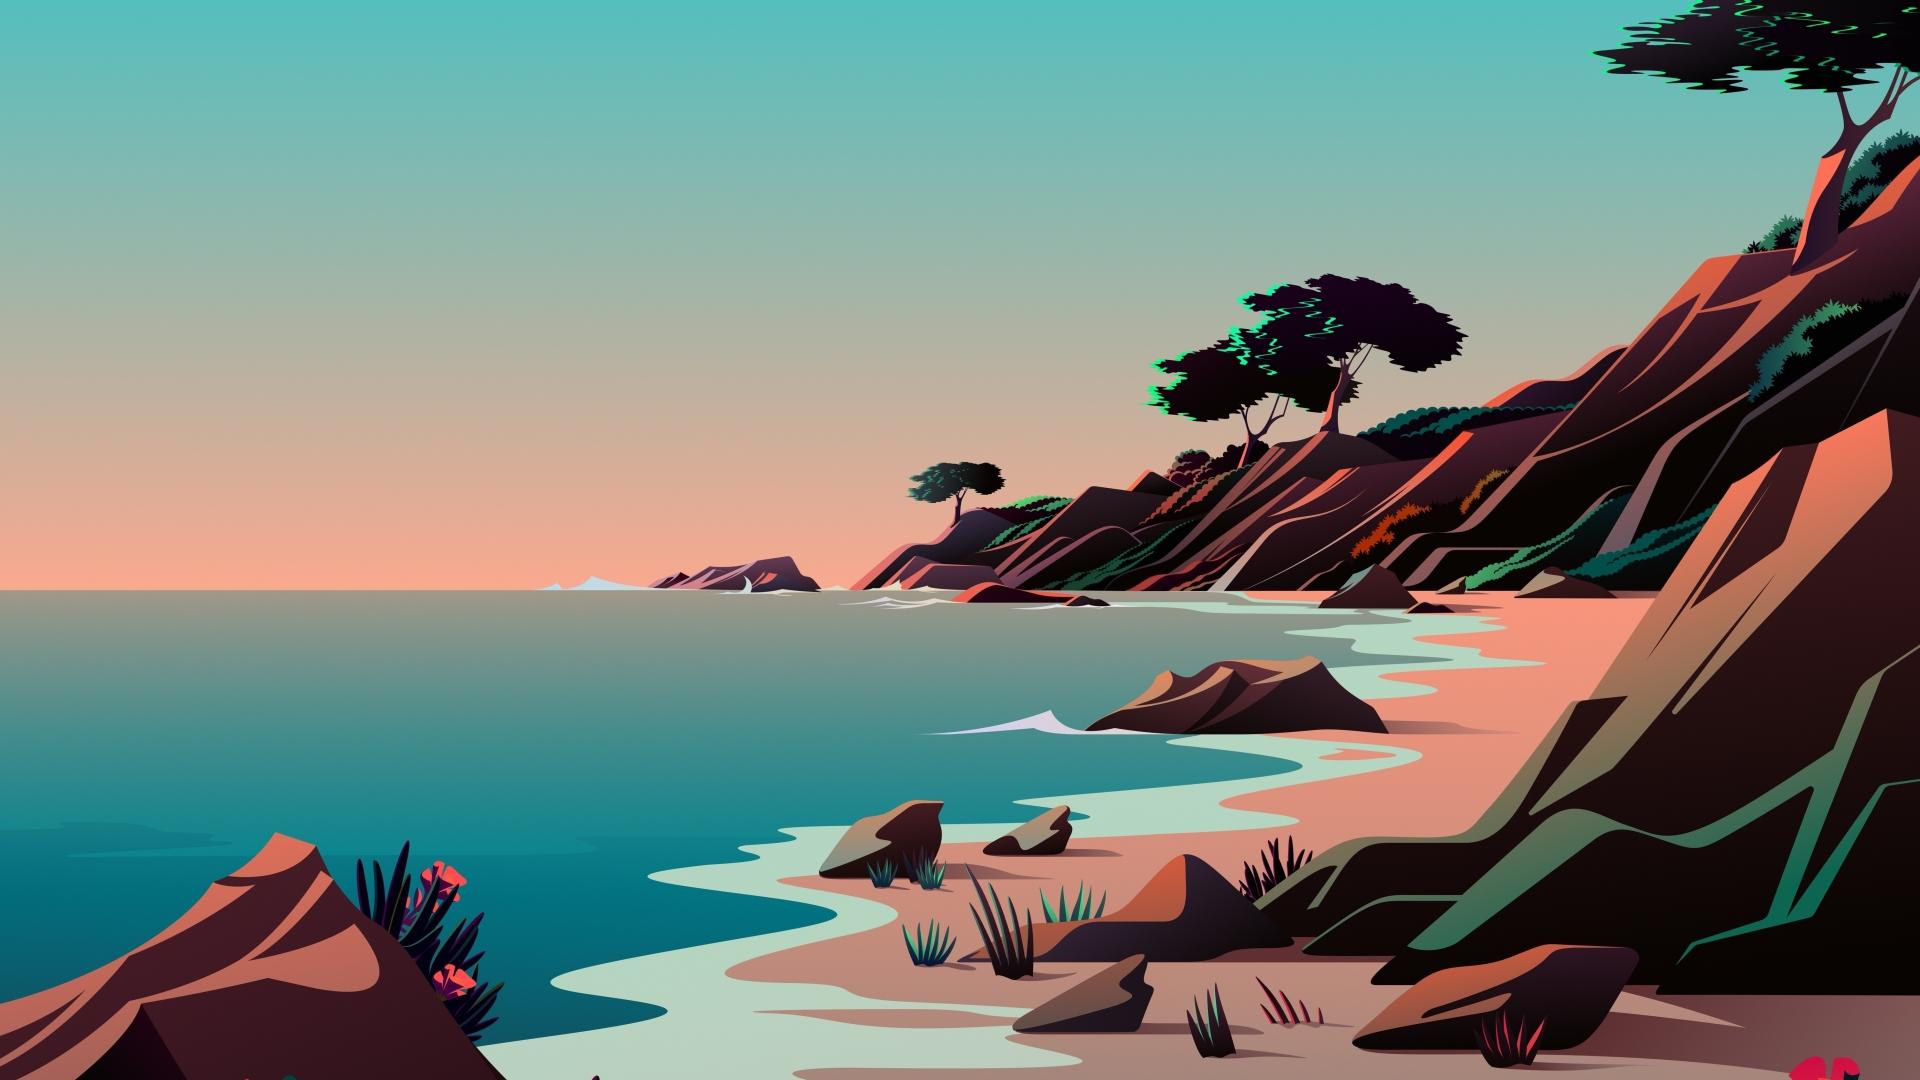 1920x1080 Beach Minimalist Digital Art 5K 1080P Laptop ...